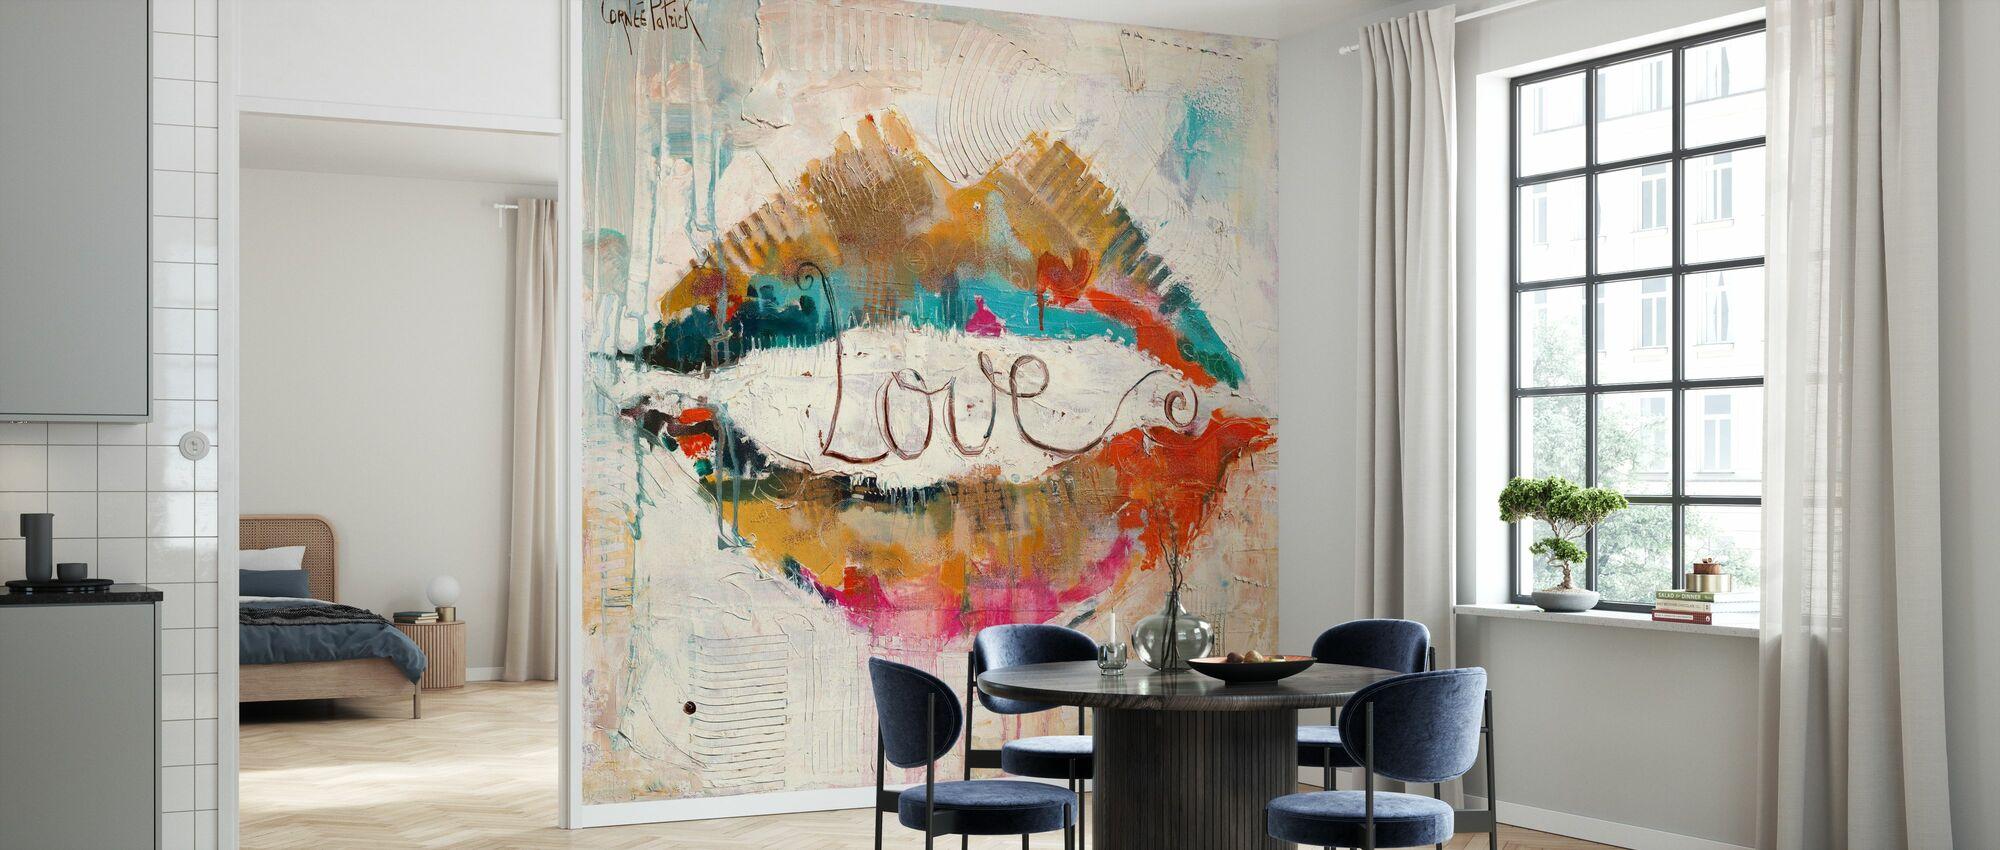 Love - Wallpaper - Kitchen